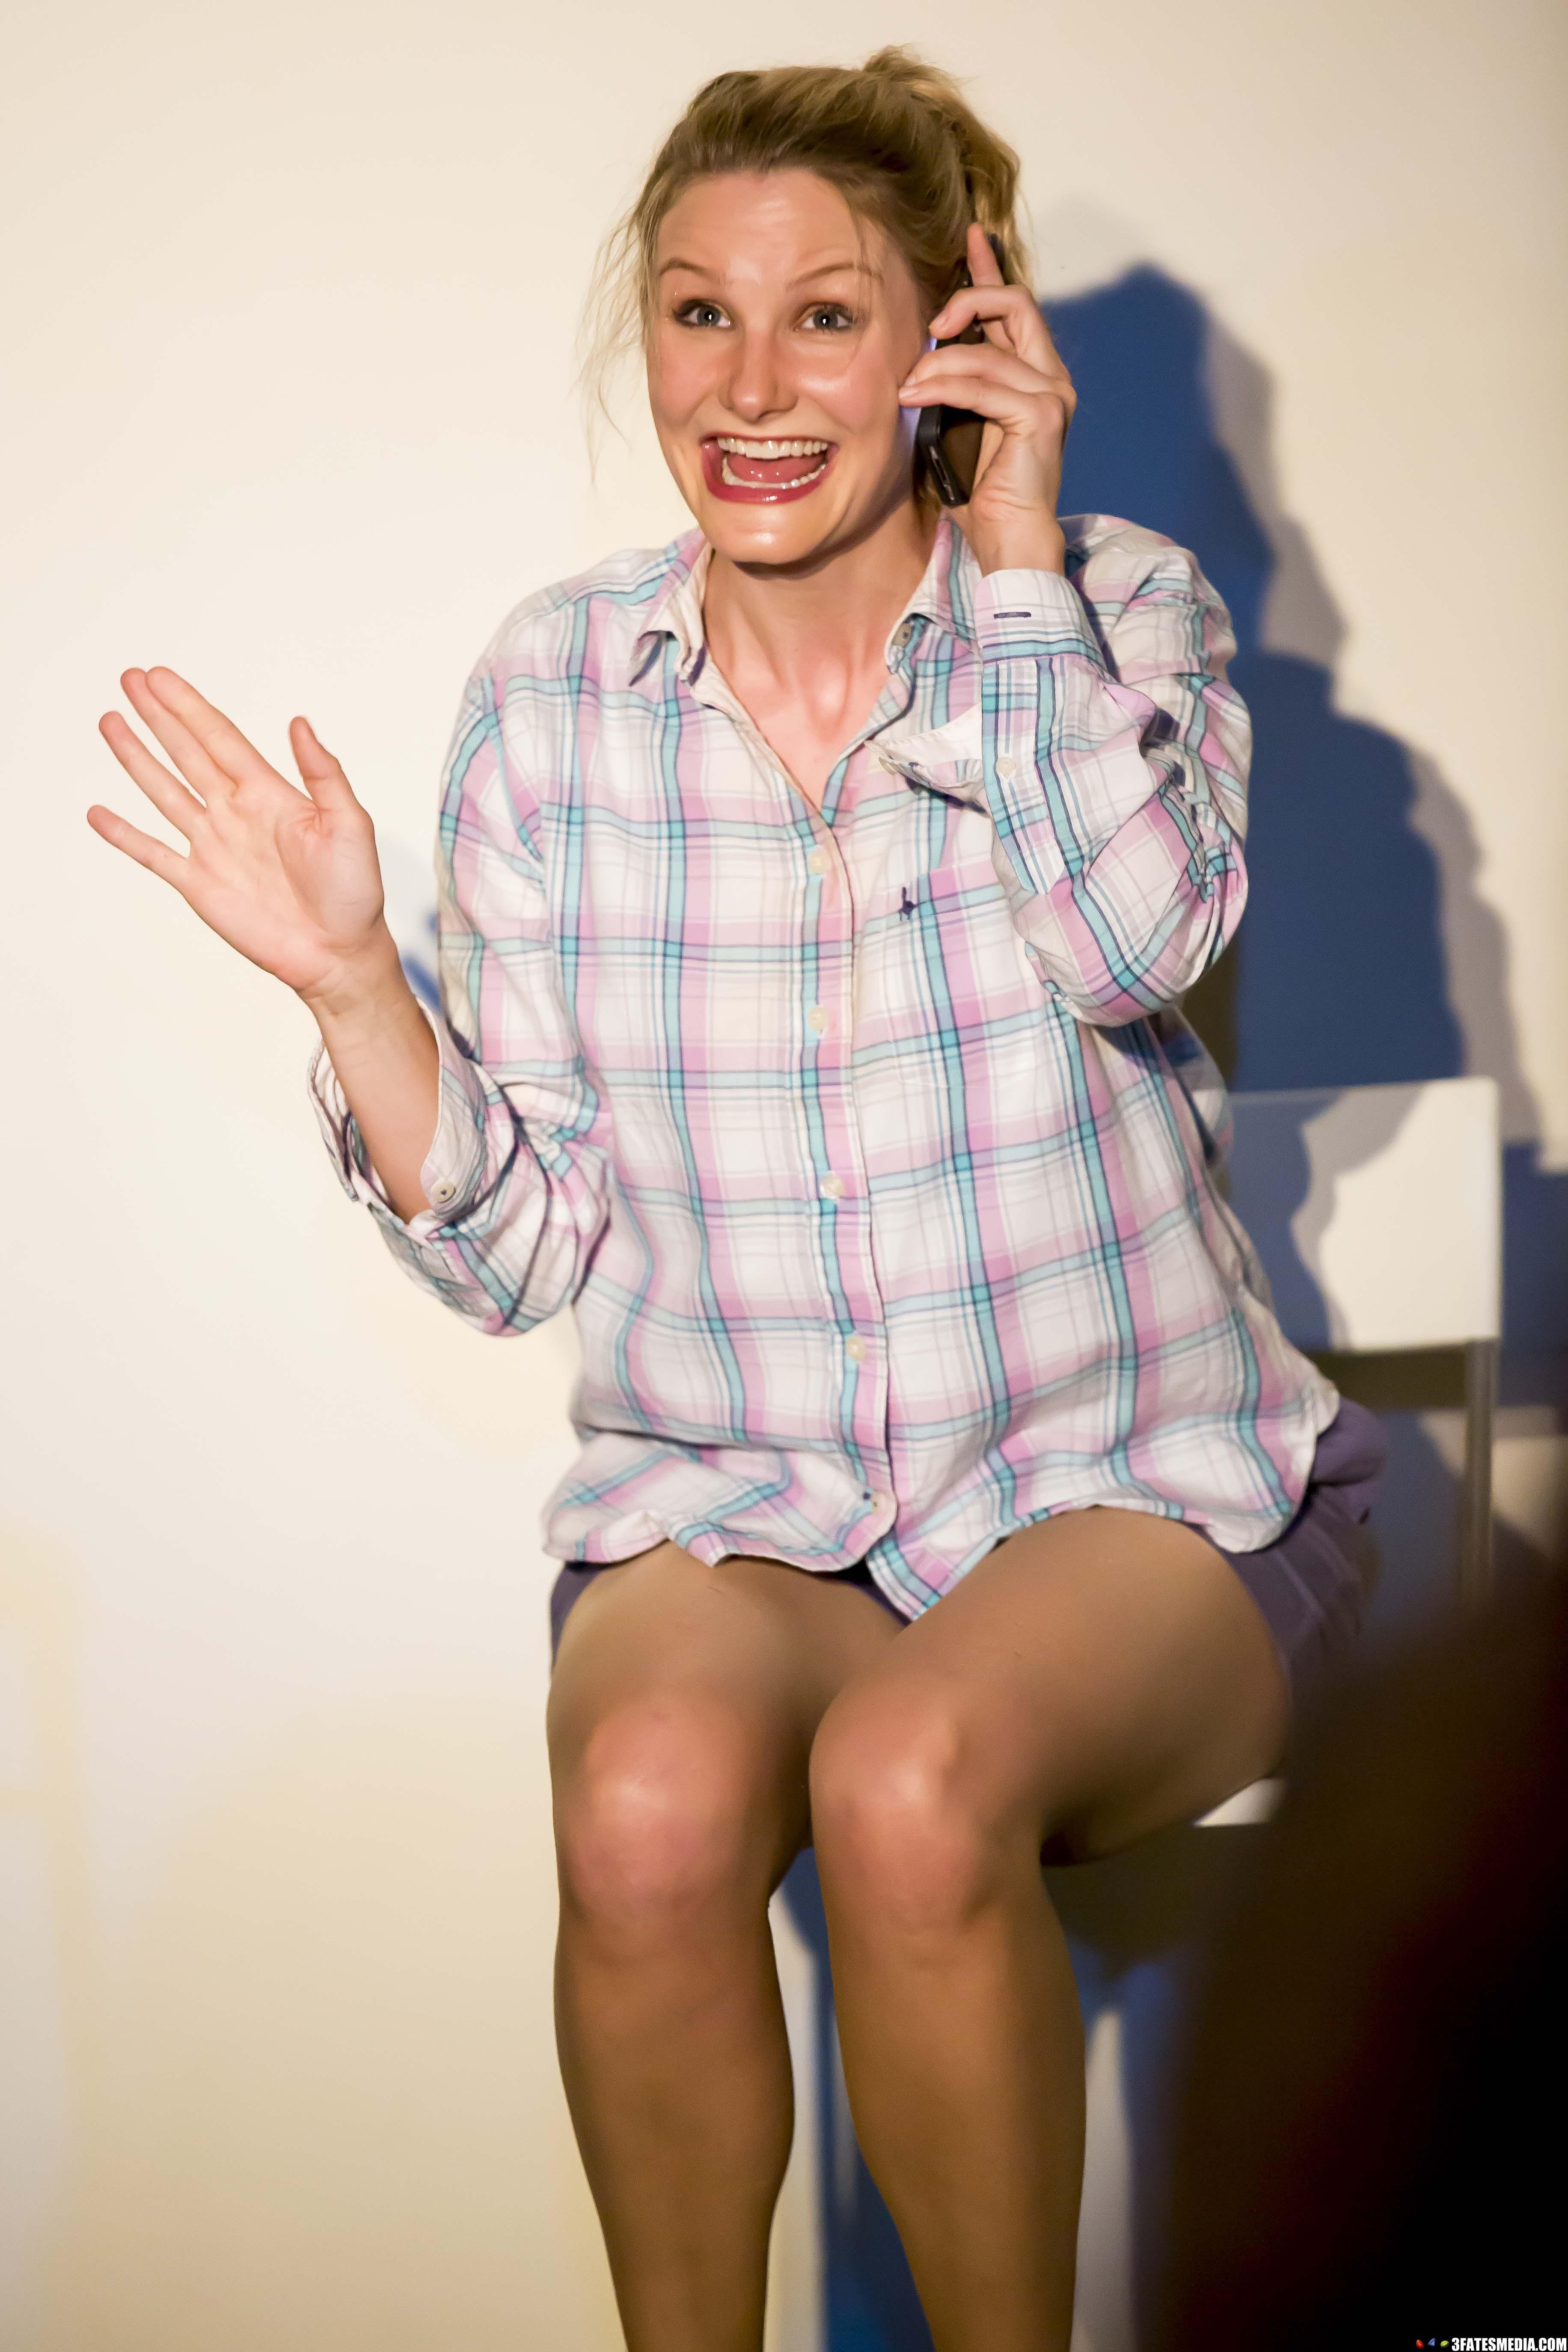 Media Release starring Isabella LaVette (9)